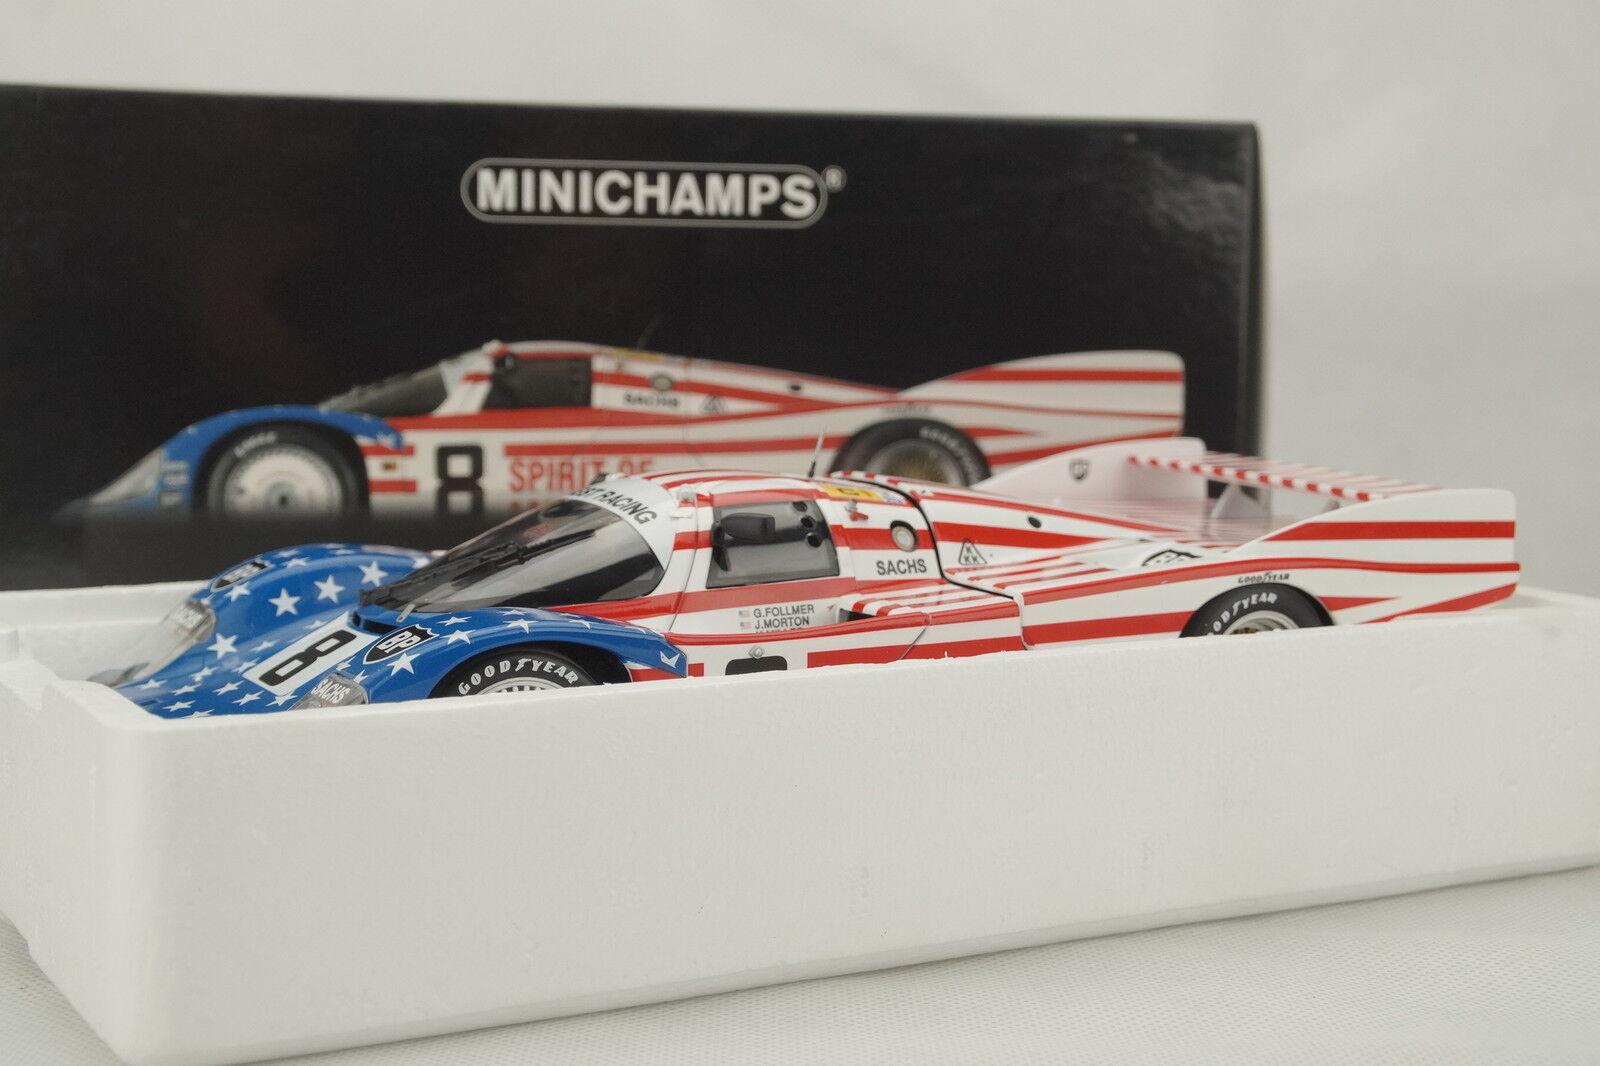 1 18 Minichamps-Porsche 956l le mans 1986 Follmer Morton Miller-rareza